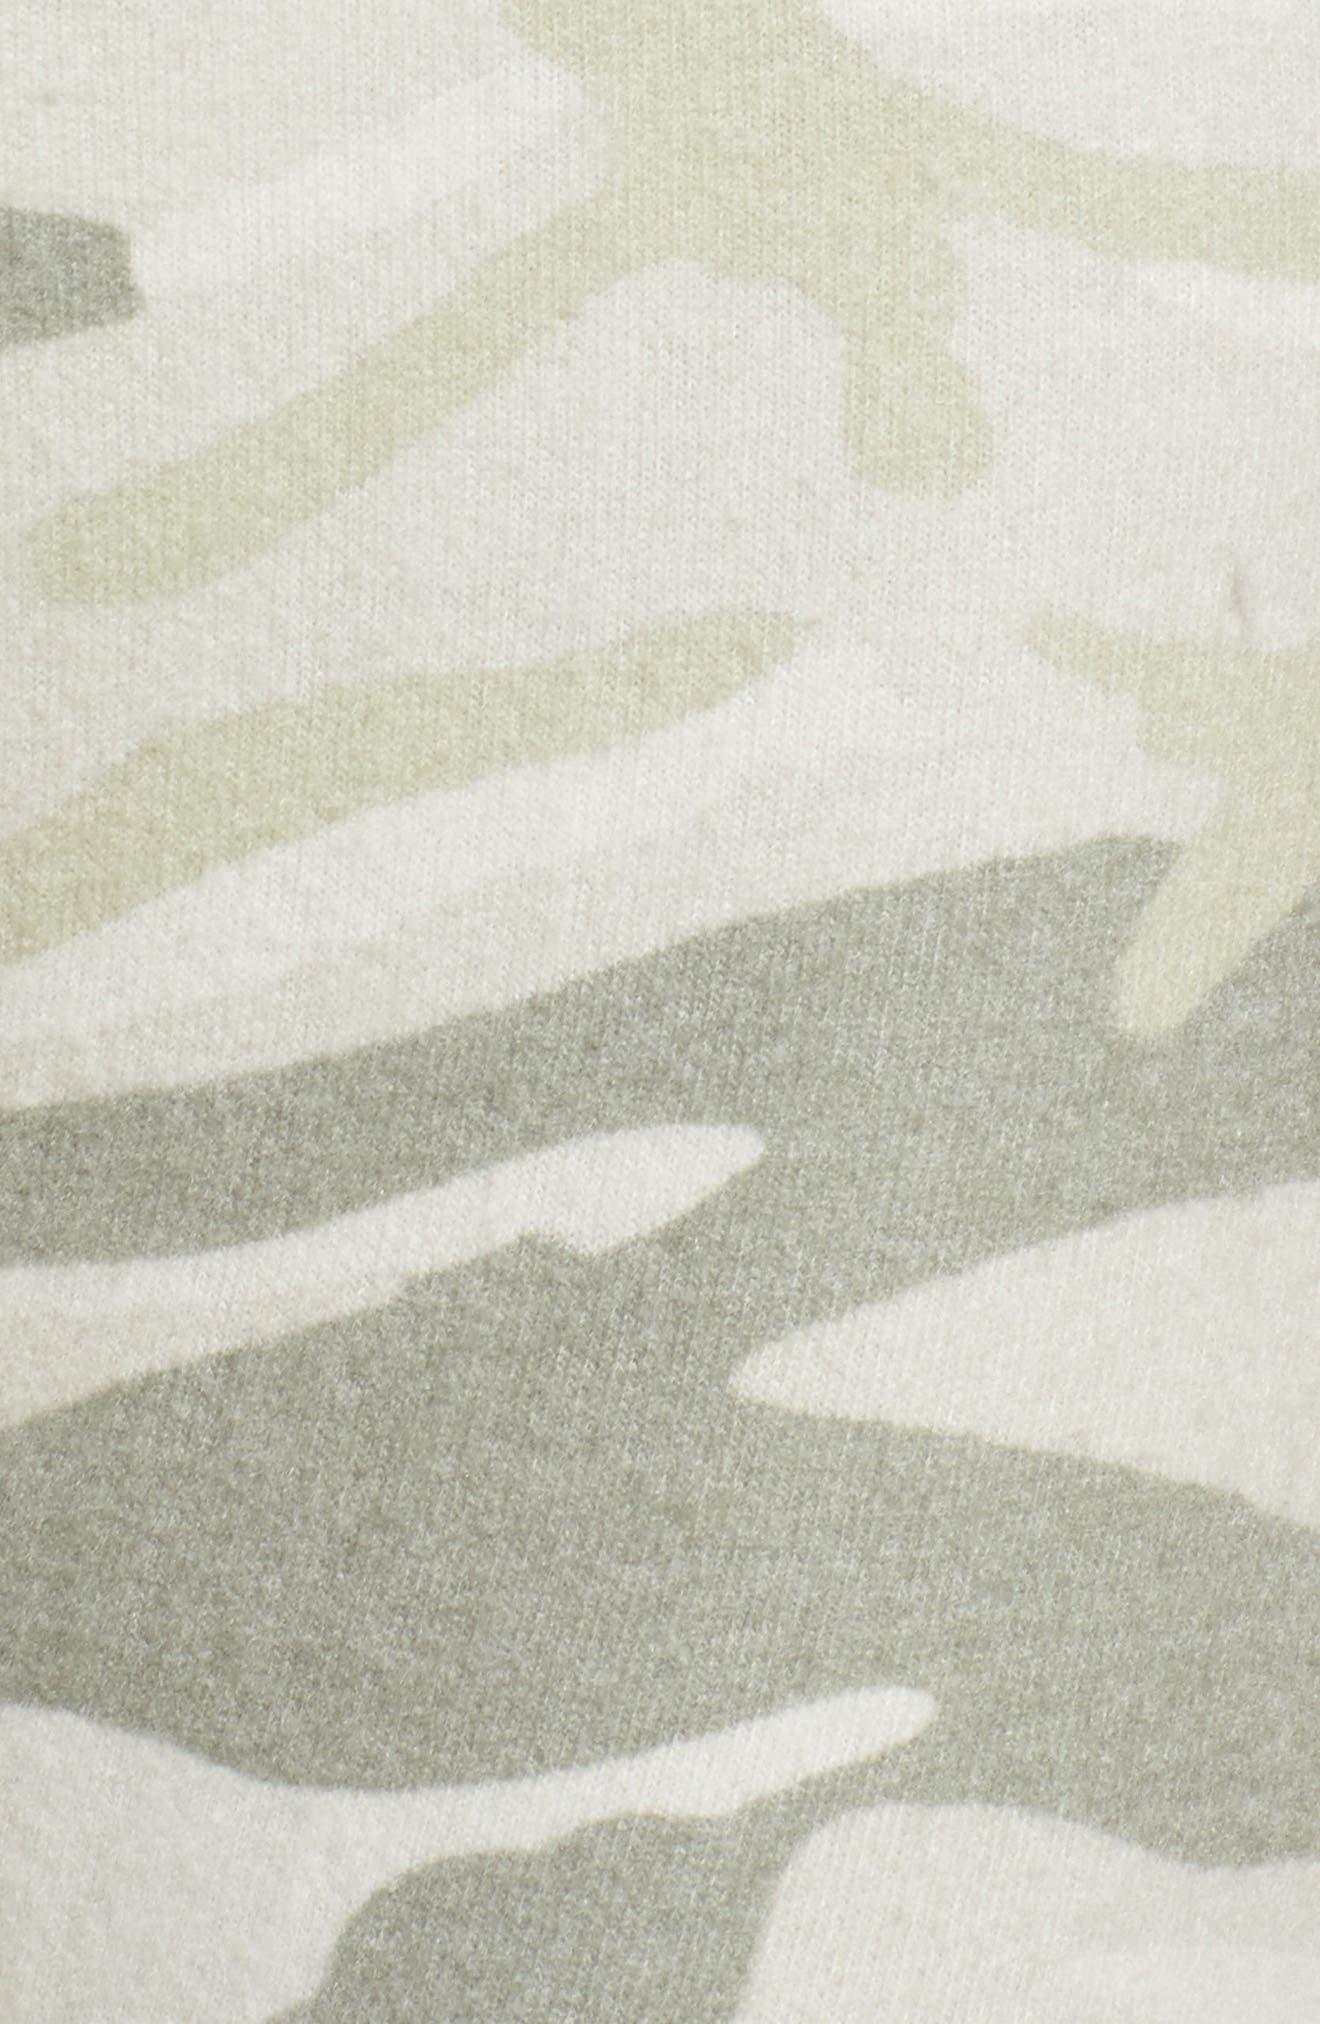 Jonas Jogger Pants,                             Alternate thumbnail 7, color,                             Green Camo